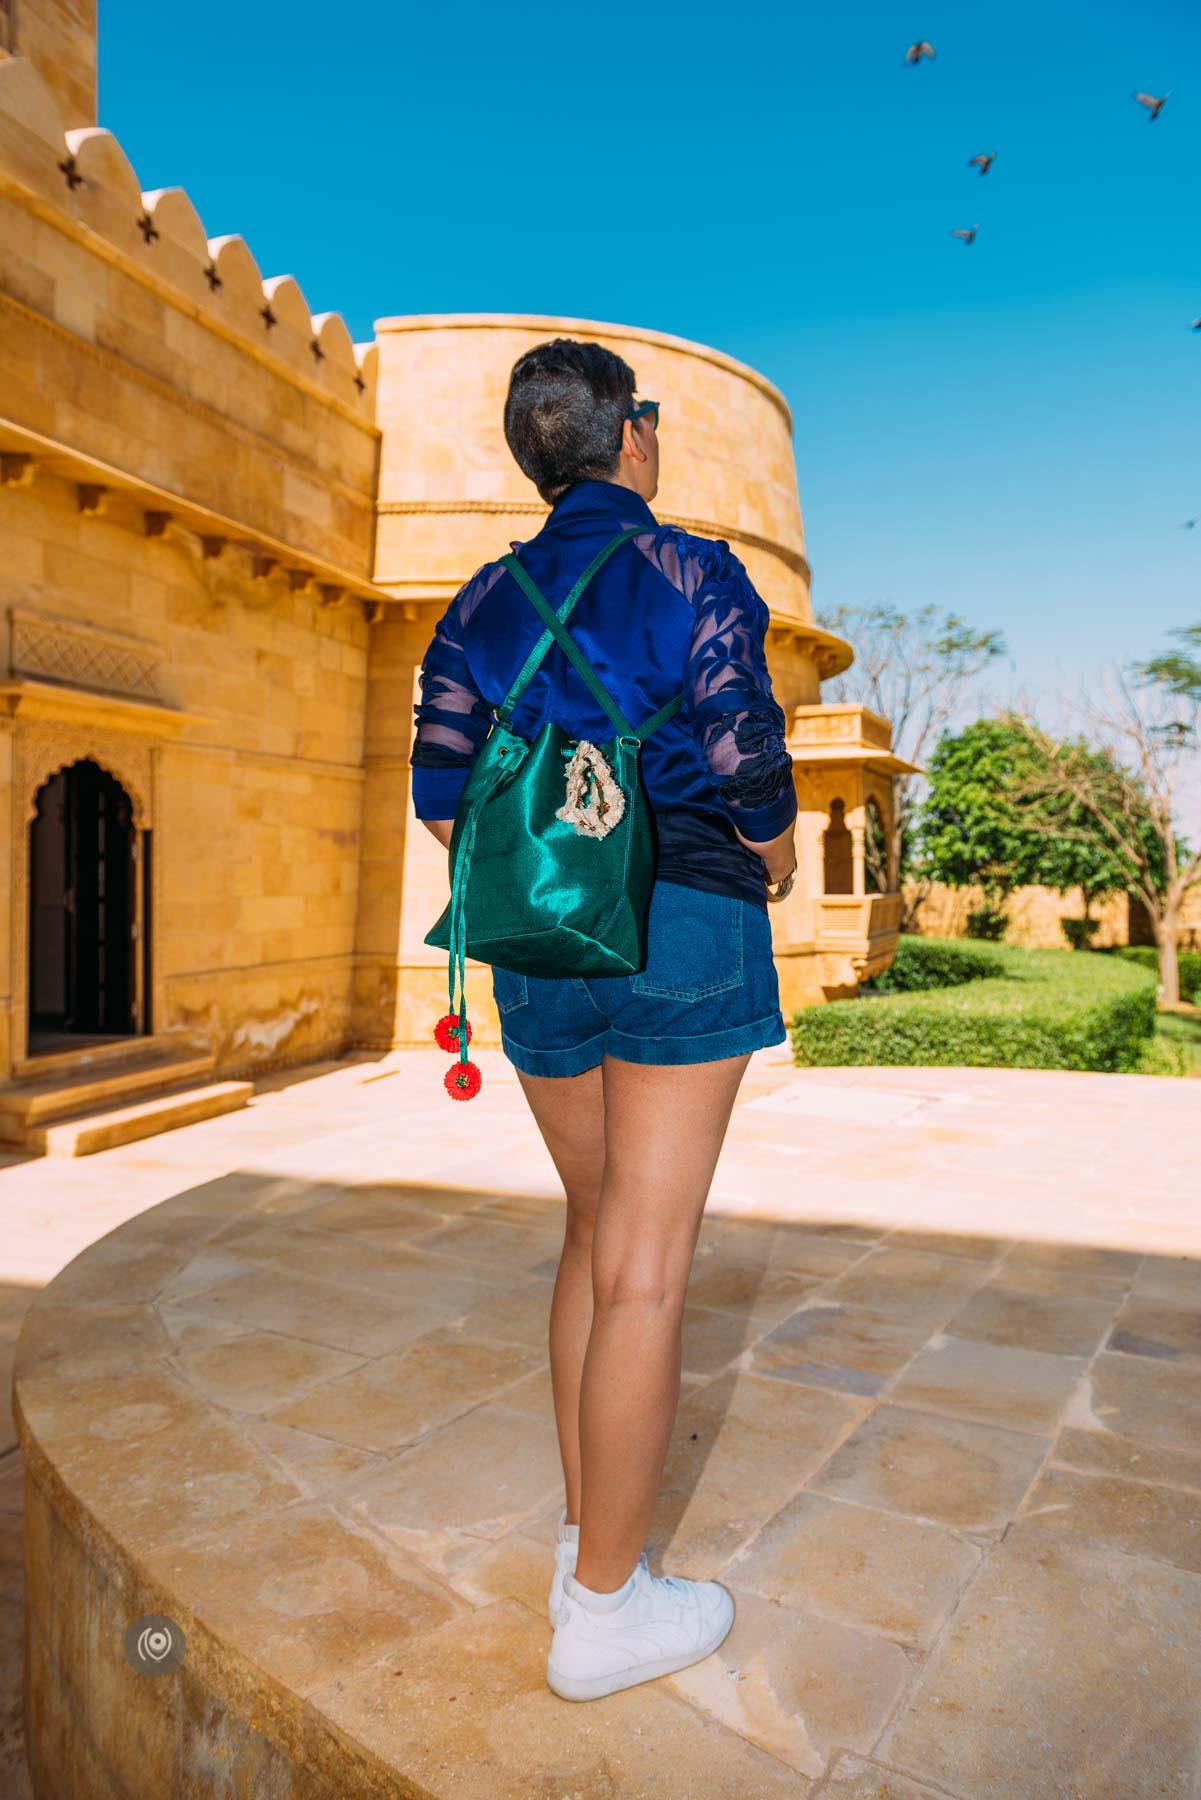 Experience Collector, Lifestyle, Lifestyle Blogger, Lifestyle Blogger India, Lifestyle Photographer India, Luxury Blogger, Luxury Blogger India, Luxury Brands, Luxury Photographer, Luxury Photographer India, Naina Redhu, Naina.co, Professional Photographer, Visual Storyteller, Visual Storyteller for Luxury Brands, Influencer, Luxury Influencer, Lifestyle Influencer, Photography Influencer, Brand Storyteller, Visual Storyteller, India, #EyesForIndia, #EyesForRajasthan, Rajasthan, #EyesForDestinations, Travel, Travel Photographer, Travel Blogger, Jaisalmer, Suryagarh, #NAINAxRayBan, #NAINAxPureGheeDesigns, #NAINAxPureGhee, #NAINAxSuryagarh, Mashru Silk, IX by Kartikeya, #CoverUp, Bucket Bag, Textile Flowers Gajra, Gatsby II, Gatsby 2 Sunglasses, Sunglasses by Ray-Ban, Ray-Ban